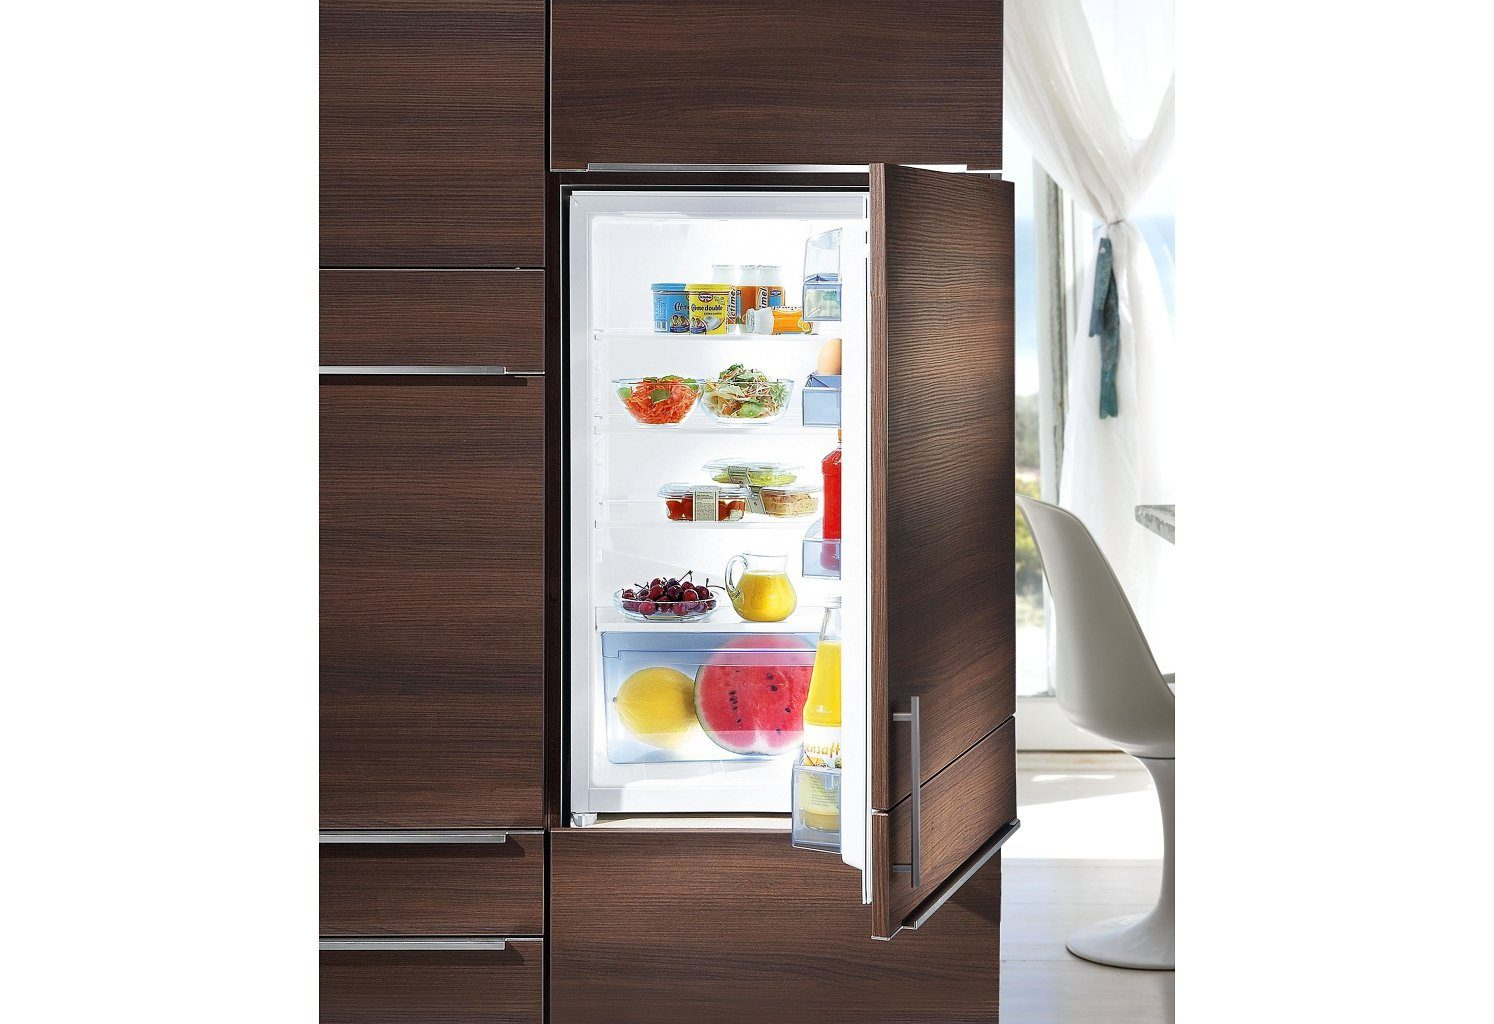 Smeg Kühlschrank 140 Cm : Einbaukühlschrank cm kühlschrank a gefrierfach bosch